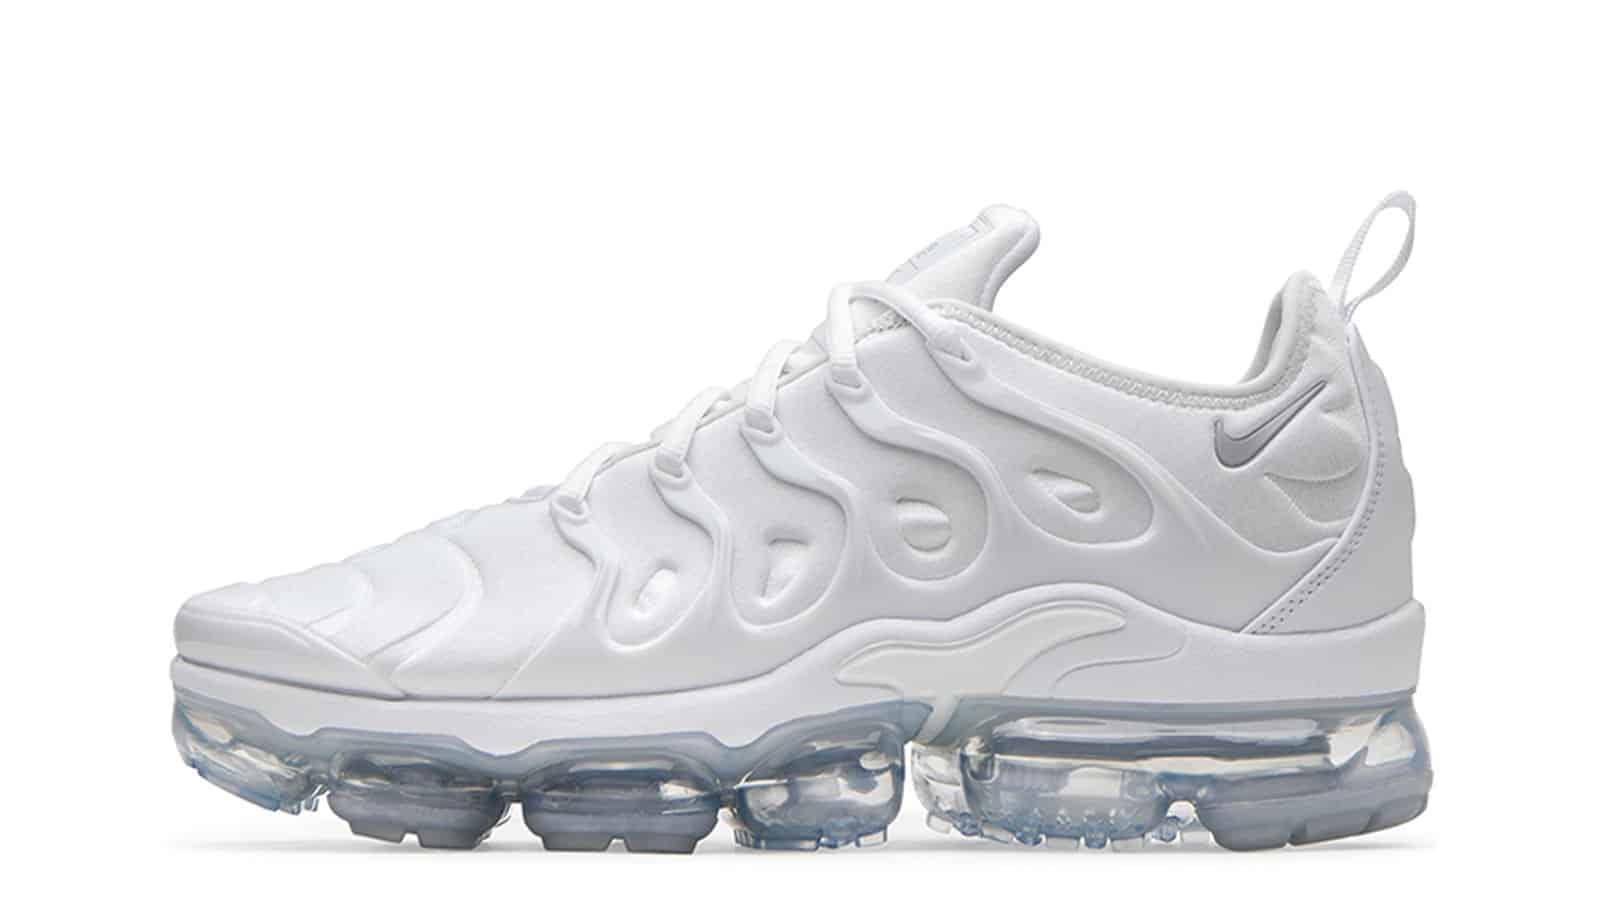 Nike Vapormax Plus Triple White